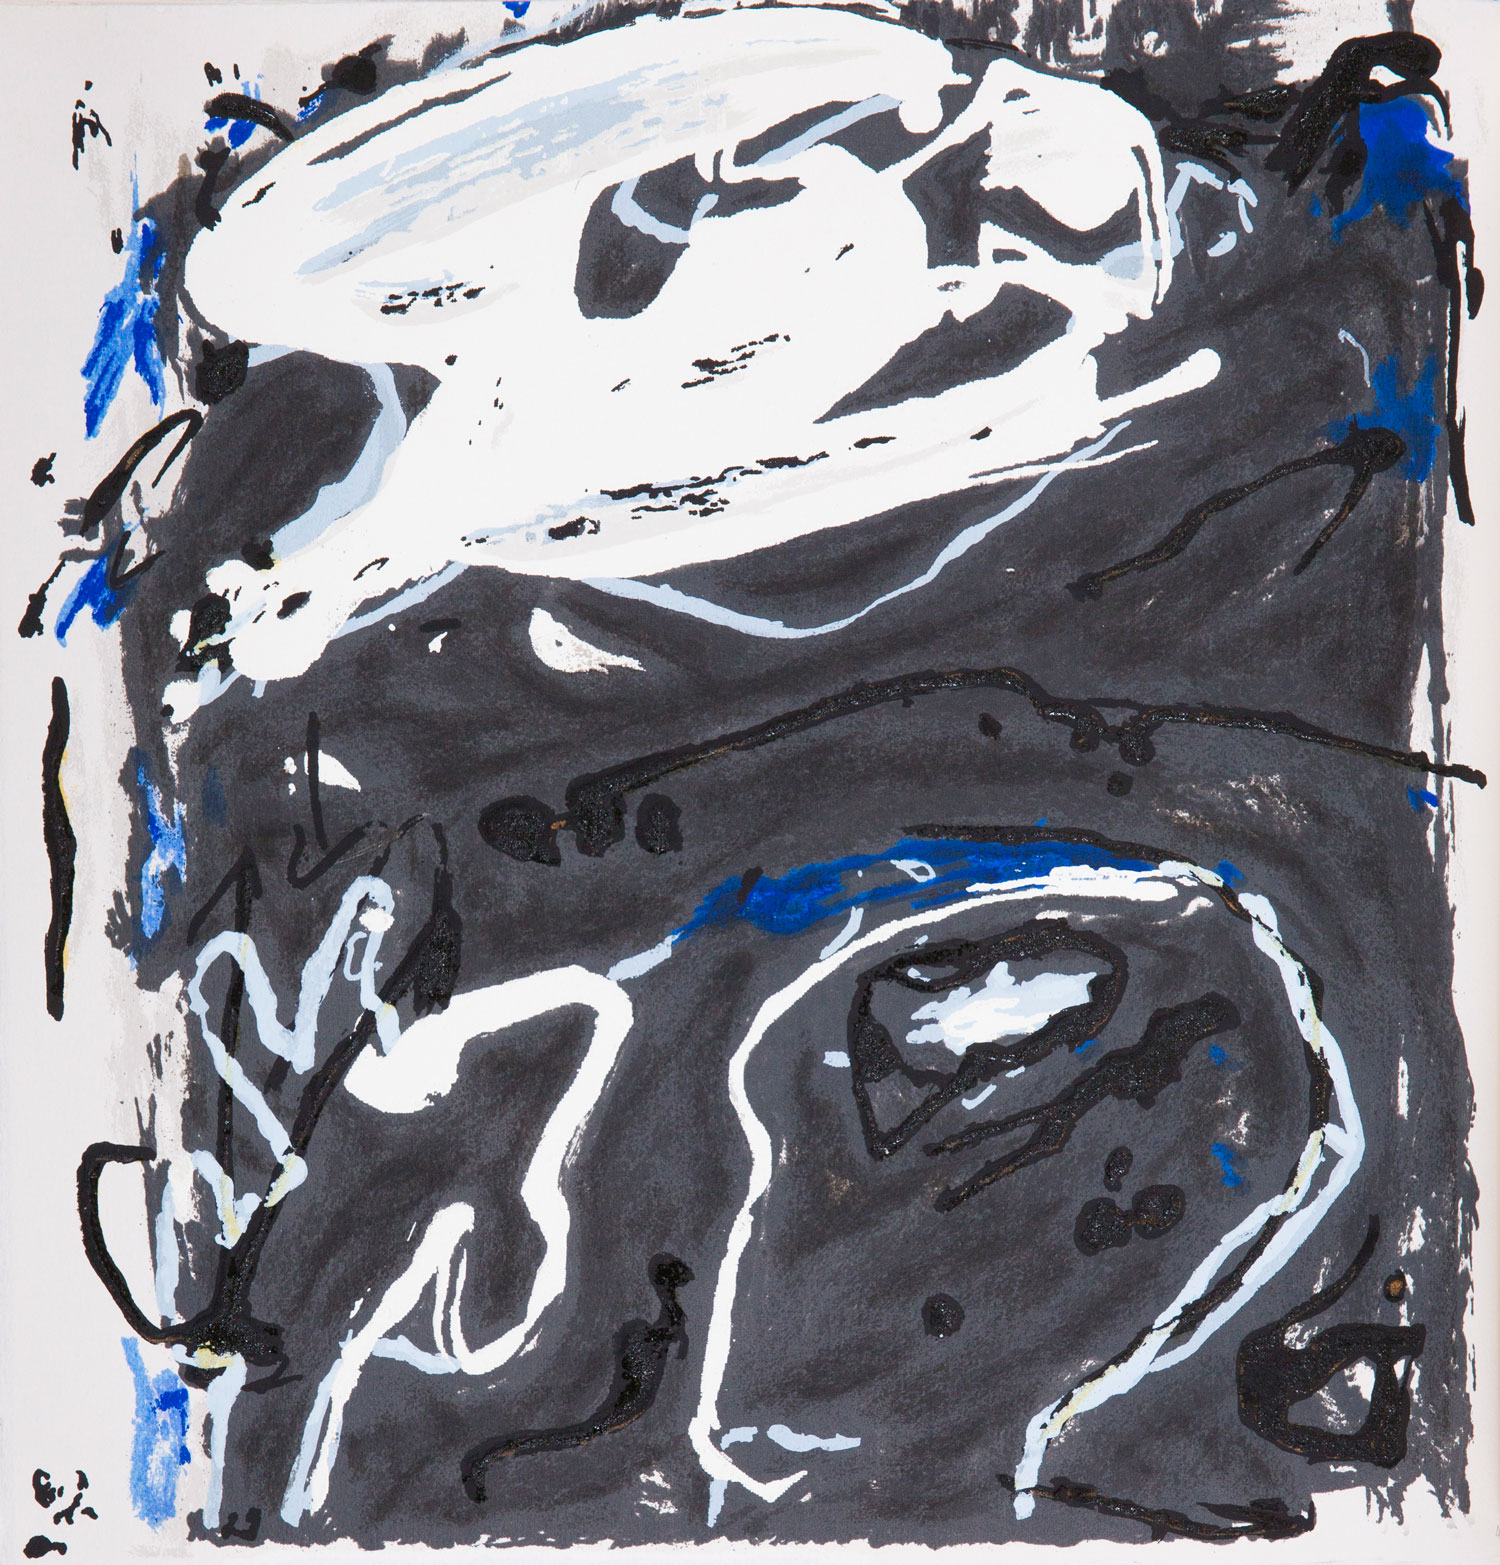 Emil Schumacher Grafik, Genesis Blatt 4, 1999